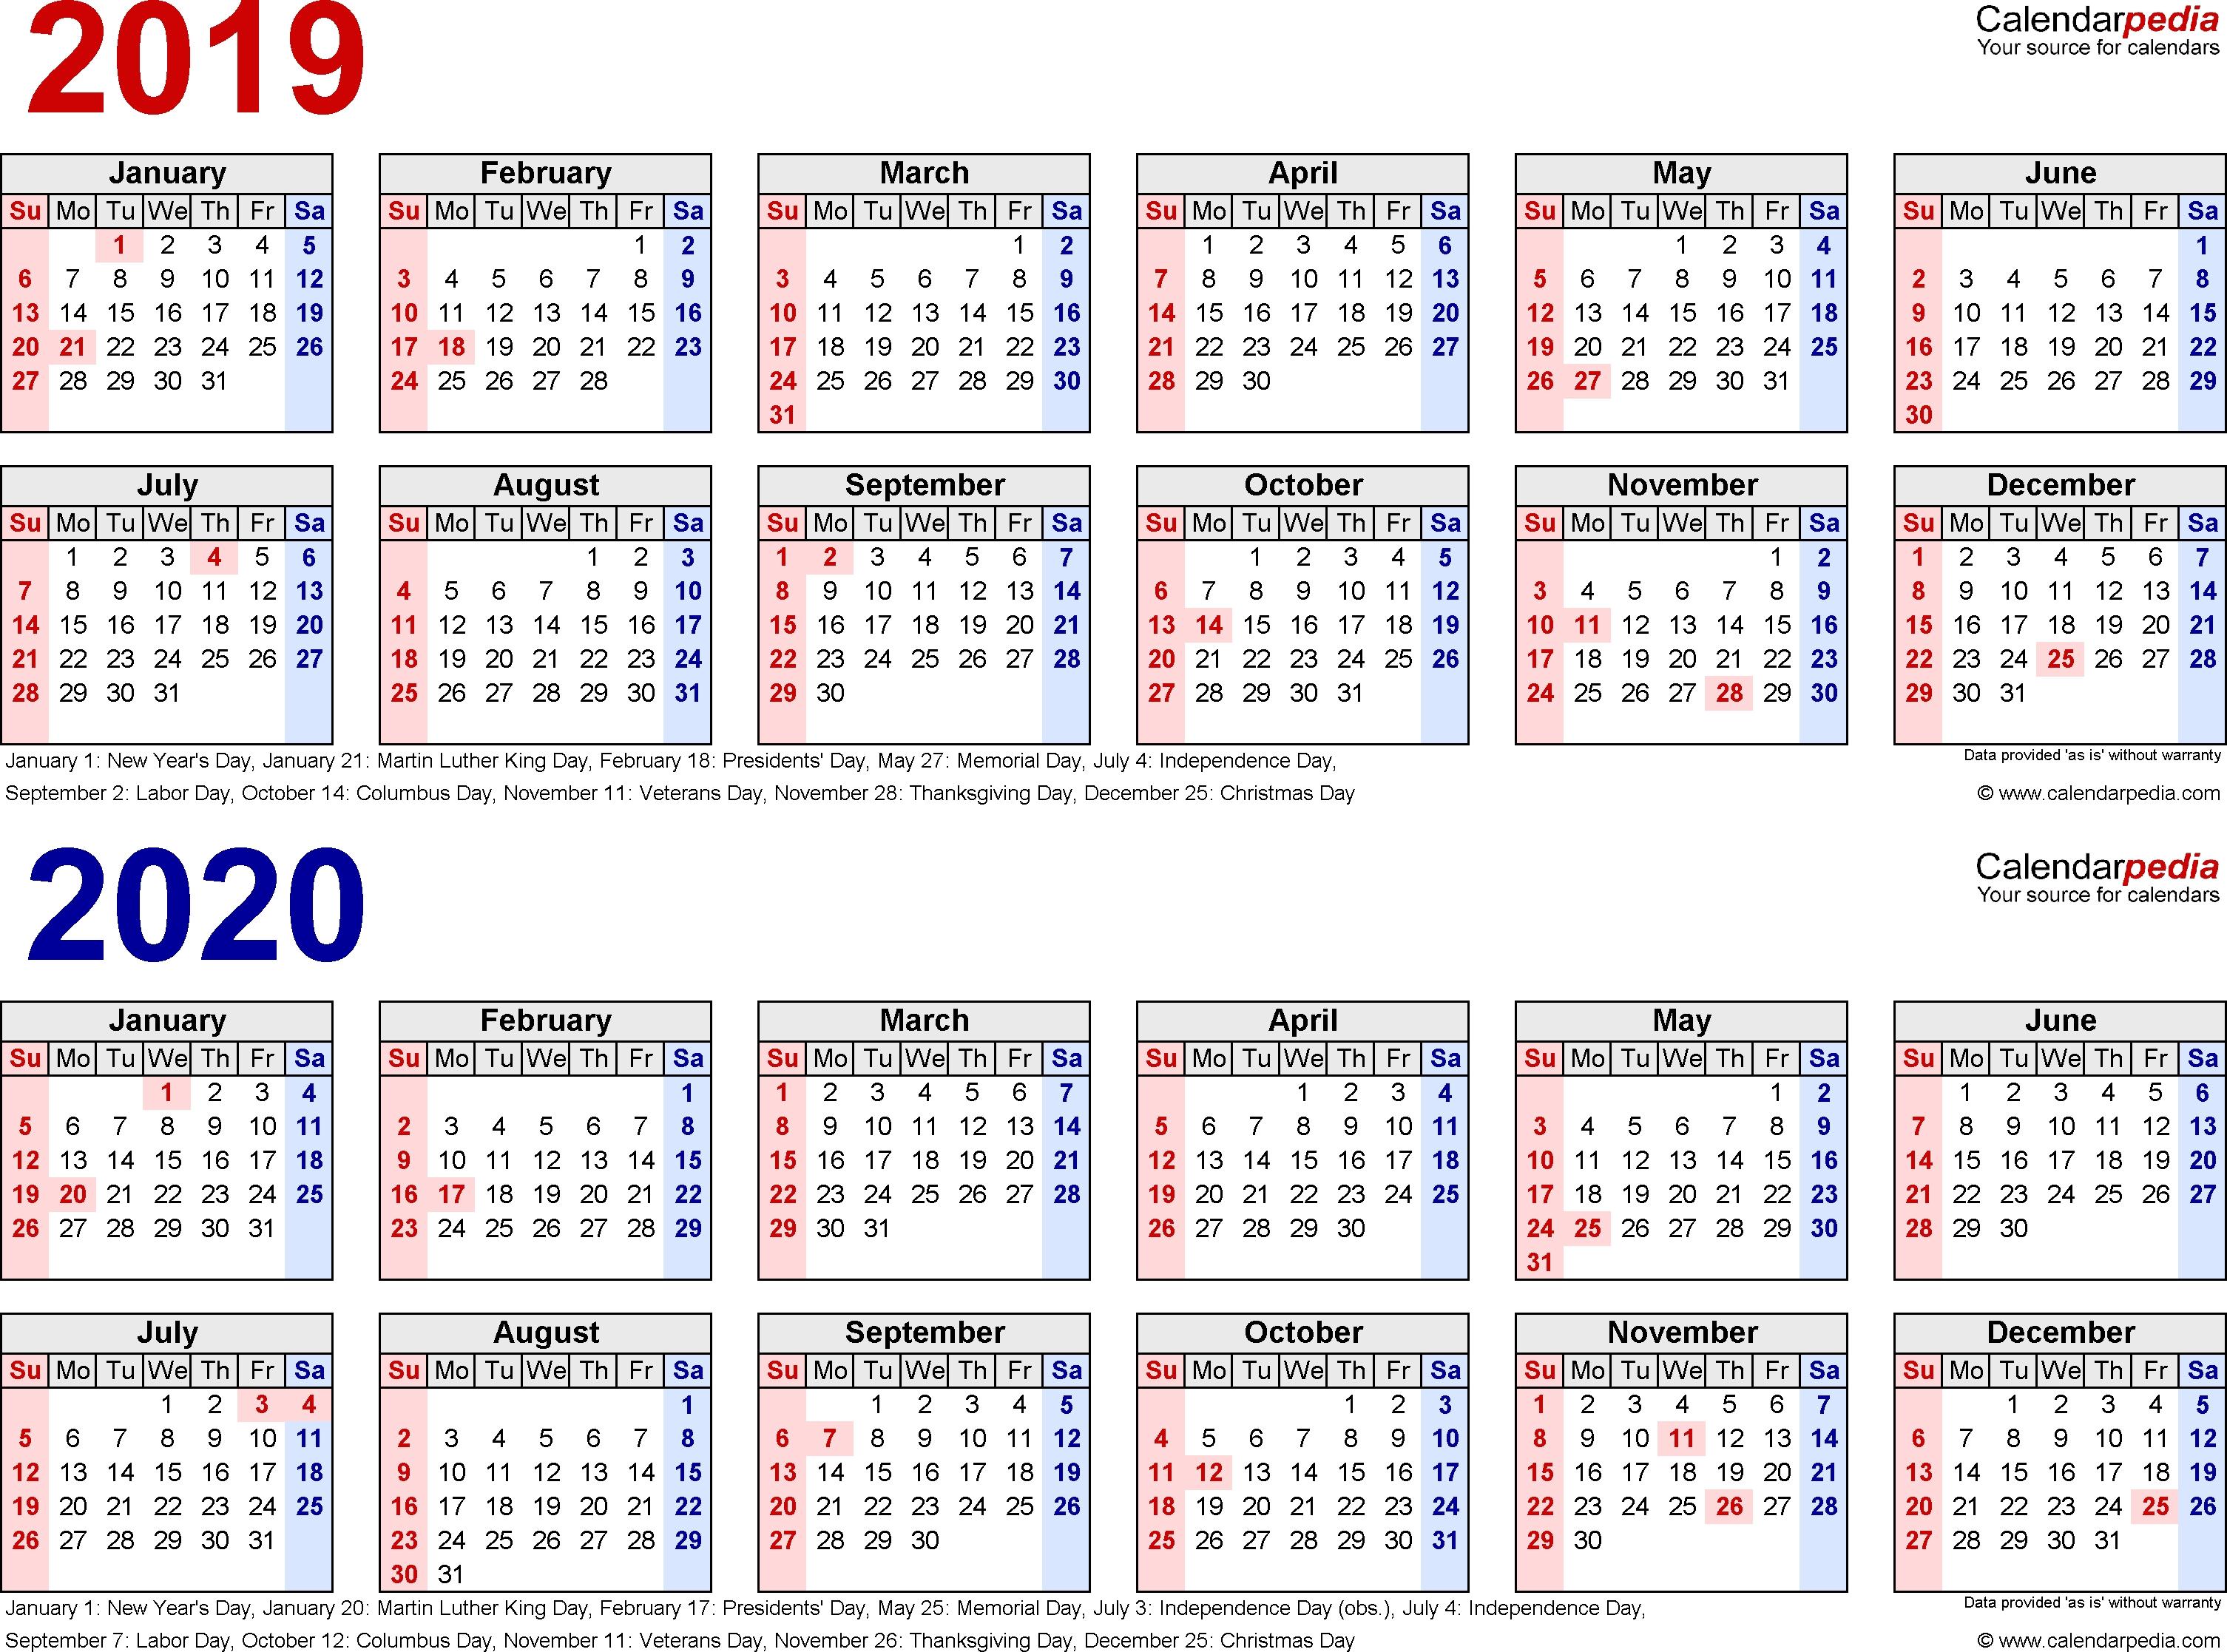 2019-2020 Calendar - Free Printable Two-Year Pdf Calendars throughout Printable 2019 2020 Calendar Pdf